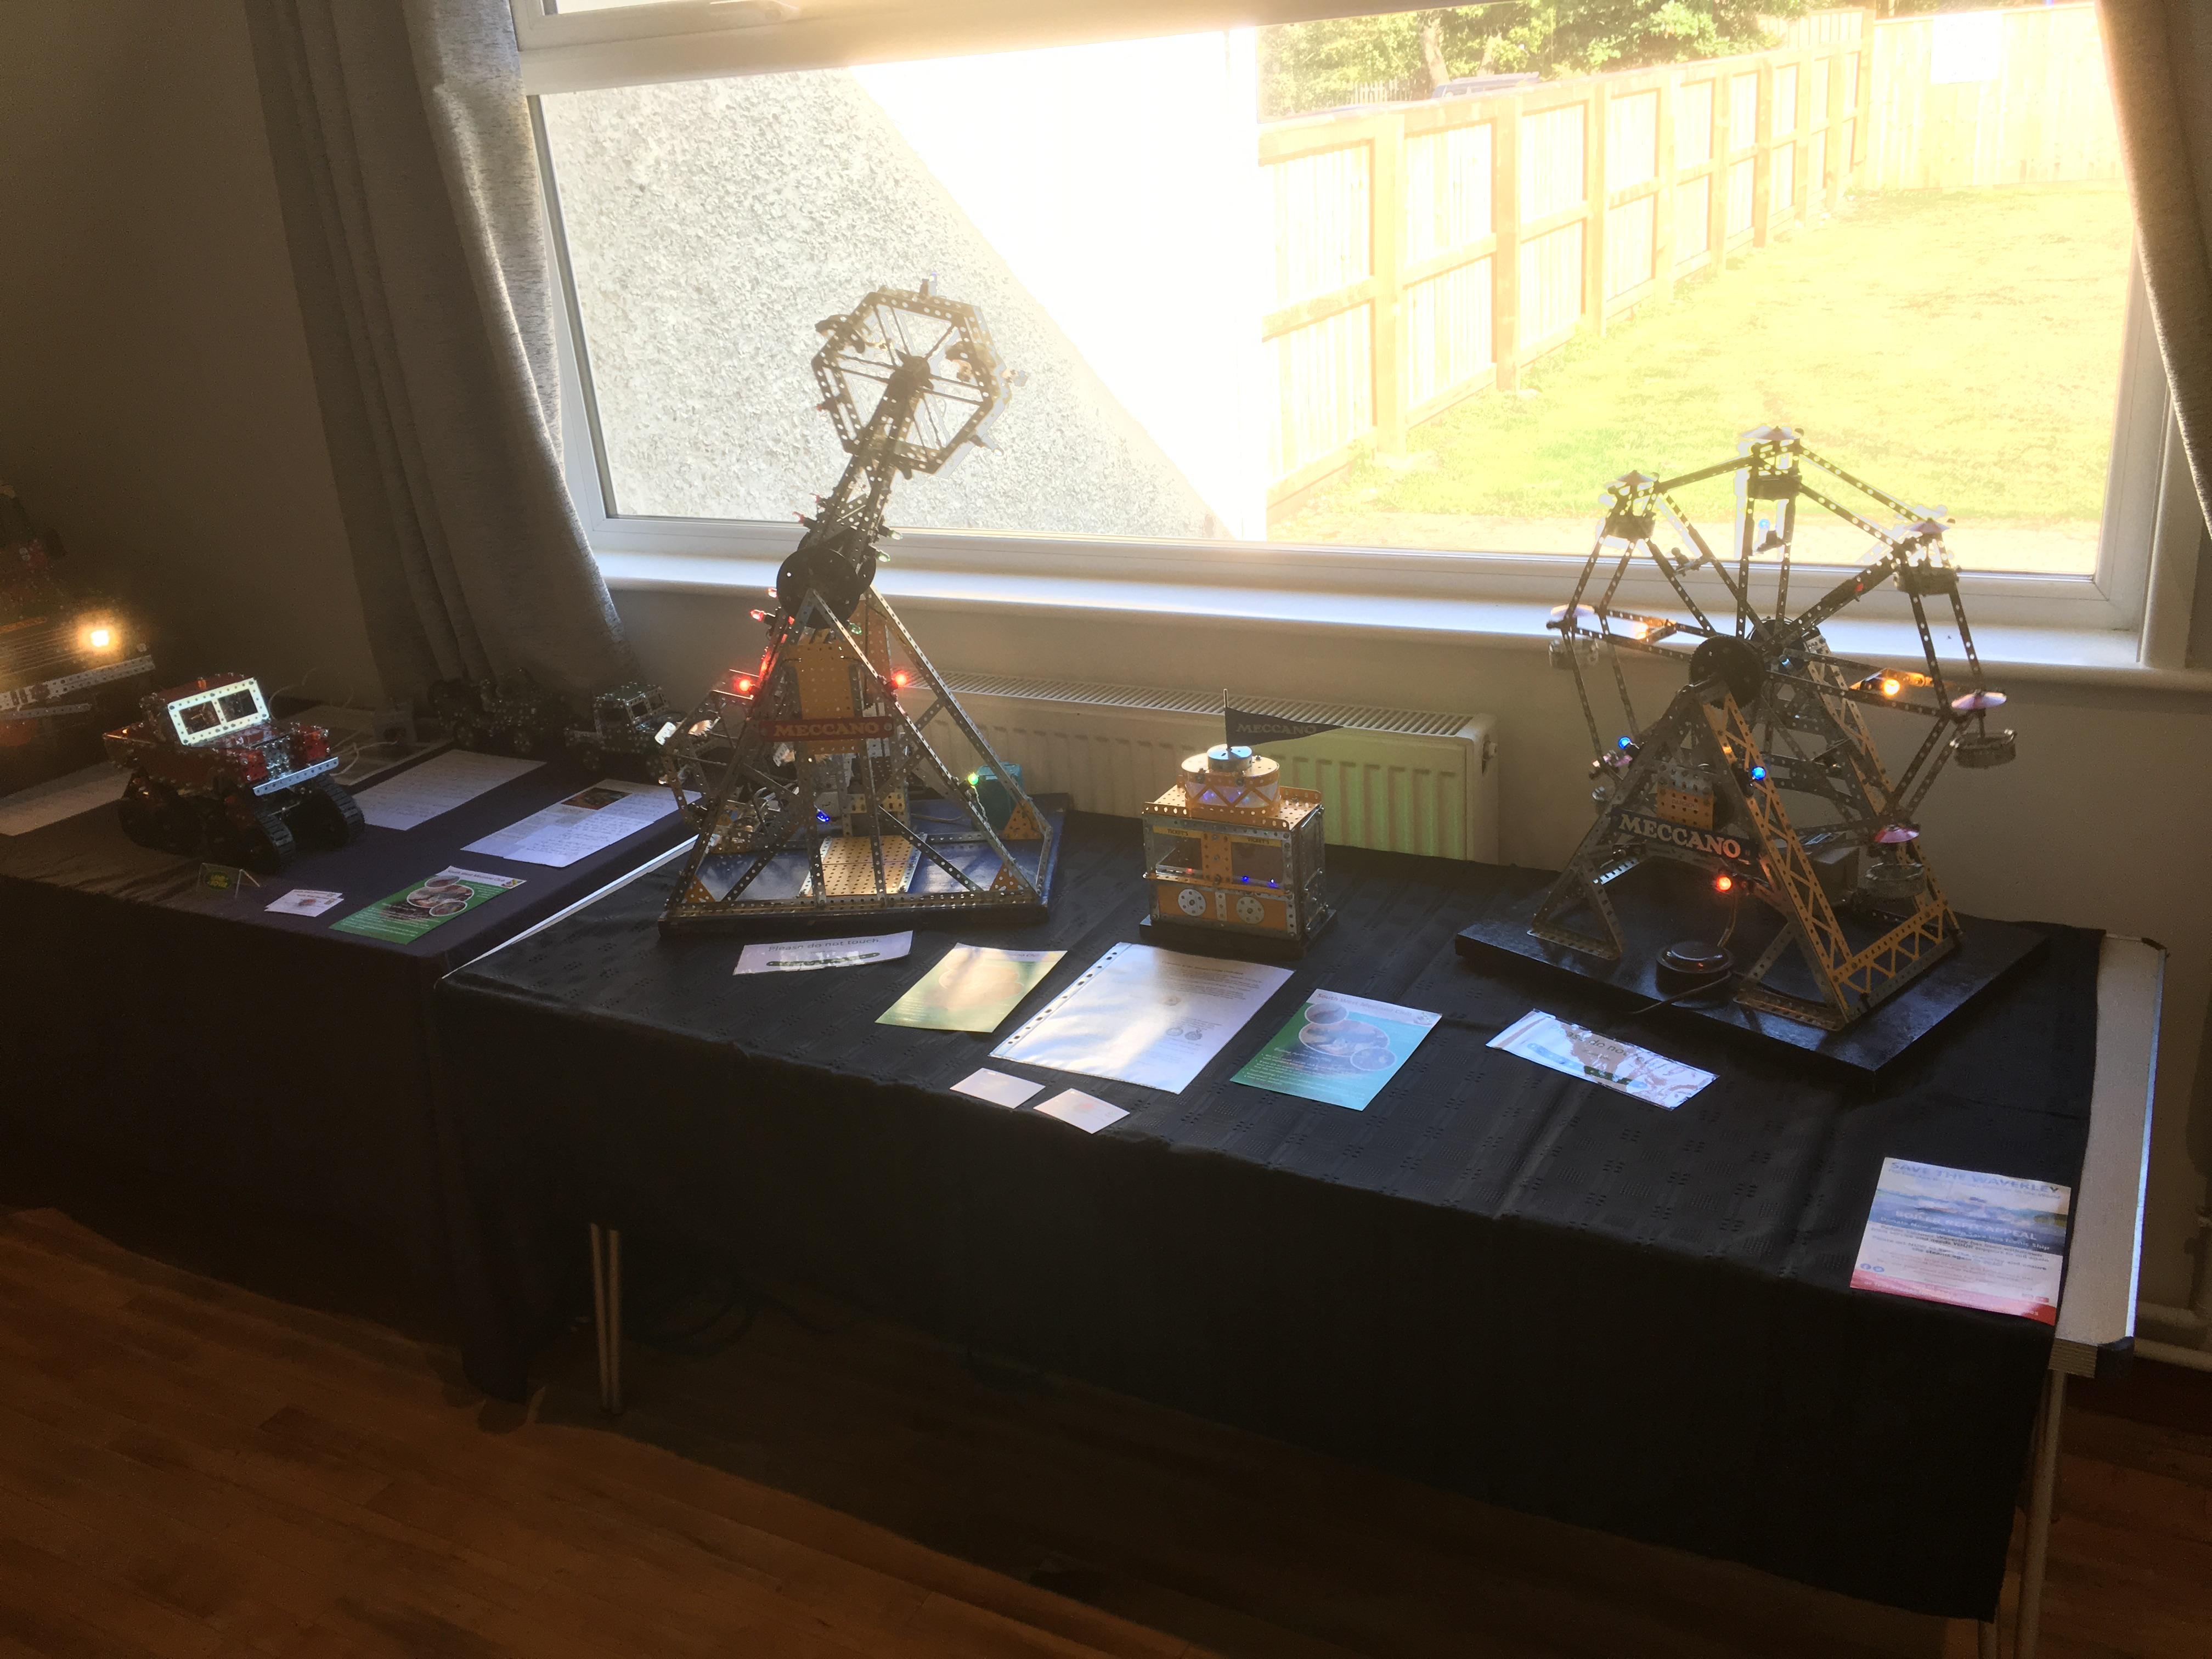 Barry Winslow shop display models